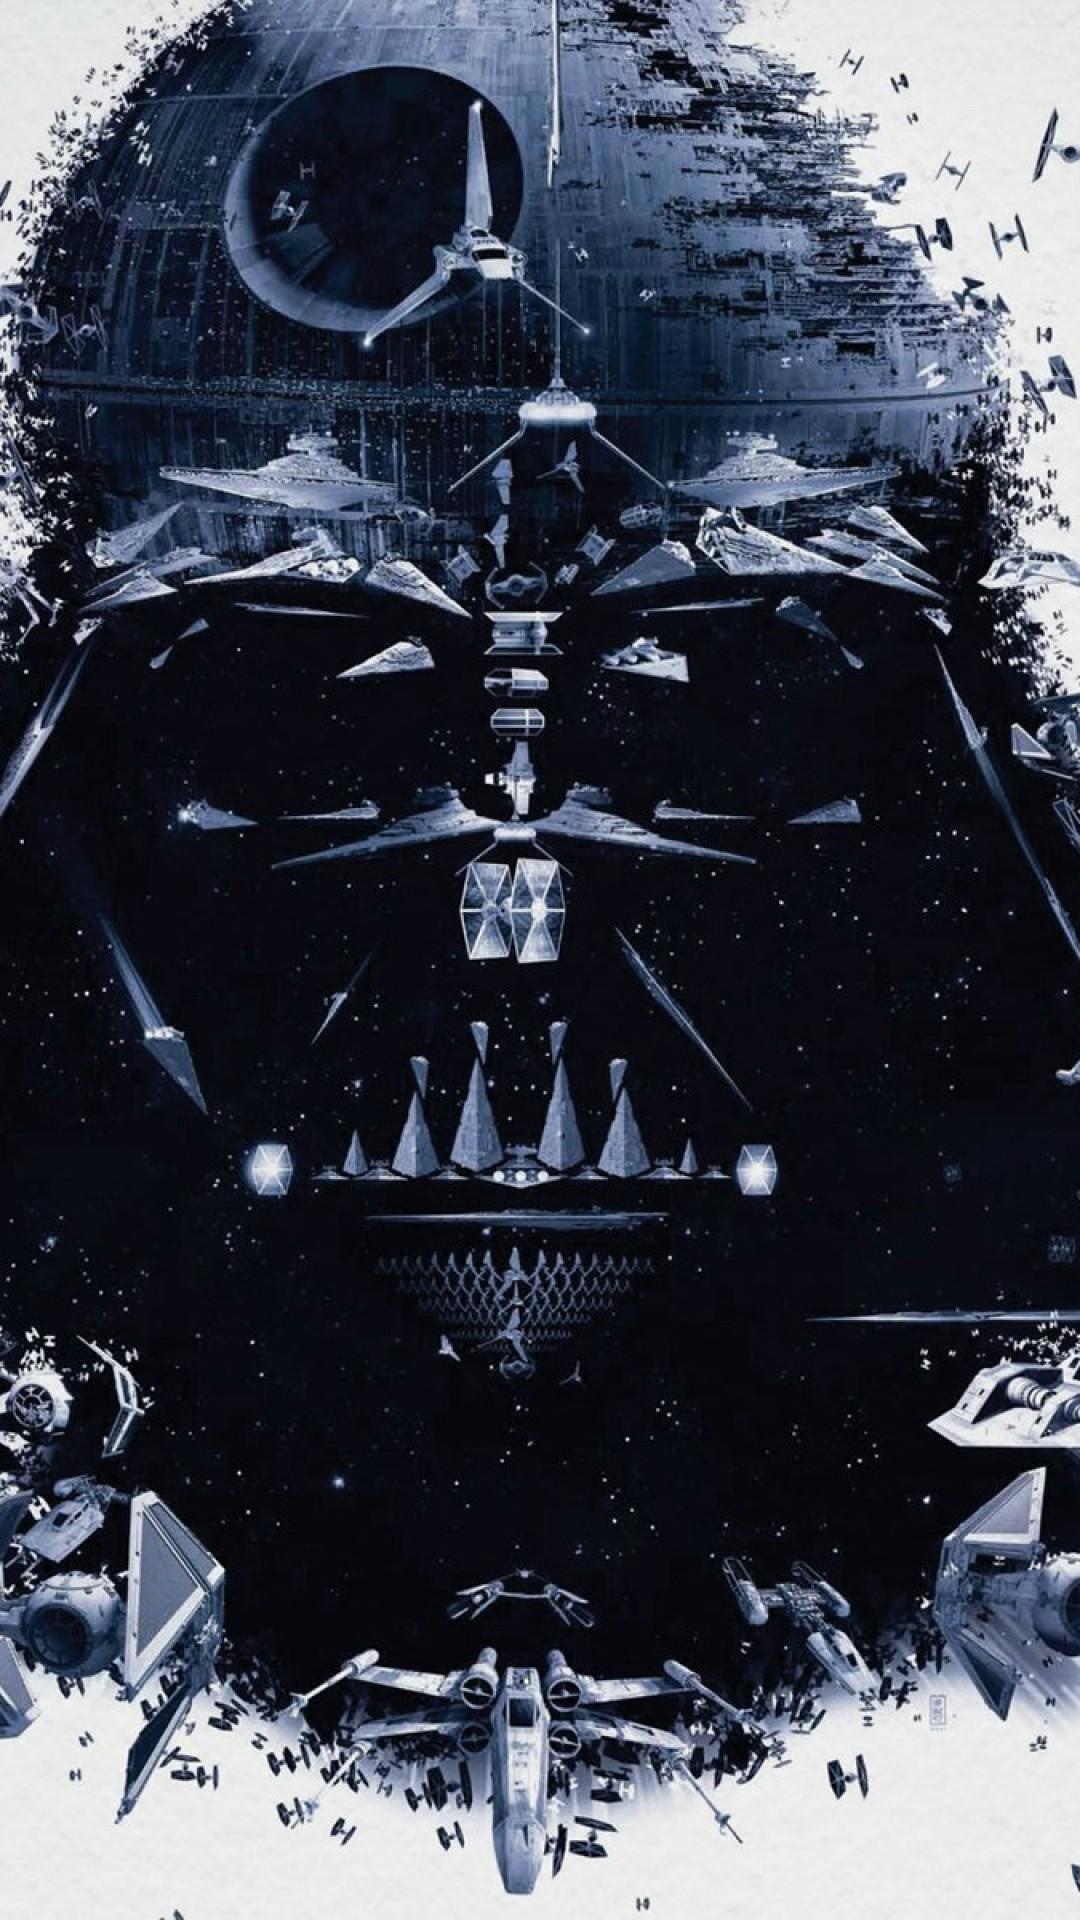 1080x1920 Star Wars Darth Vader Spaceships iPhone 6 Plus HD Wallpaper .